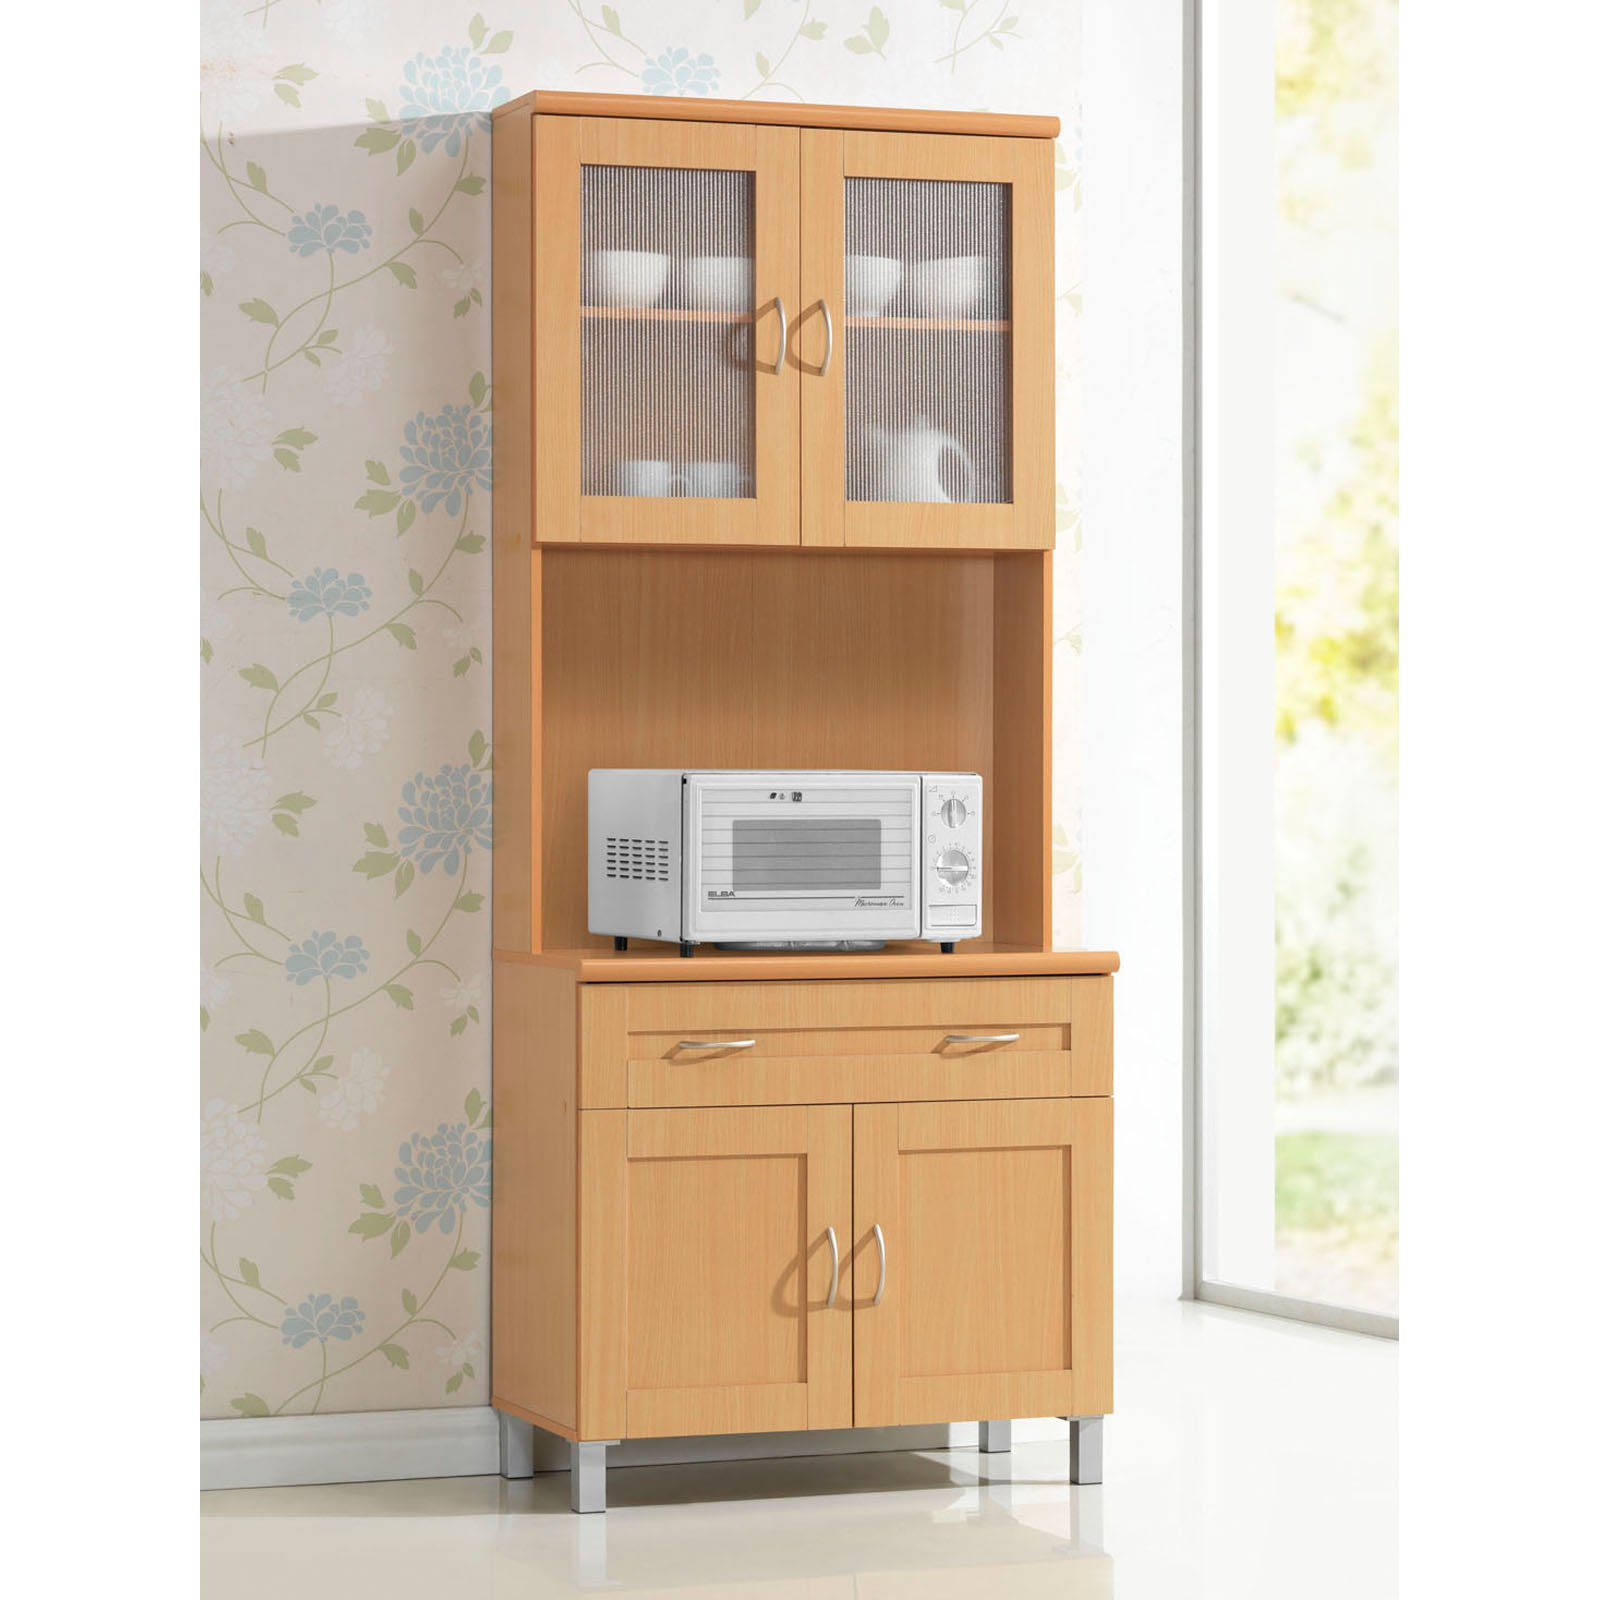 Hodedah HIK92 Kitchen Cabinet